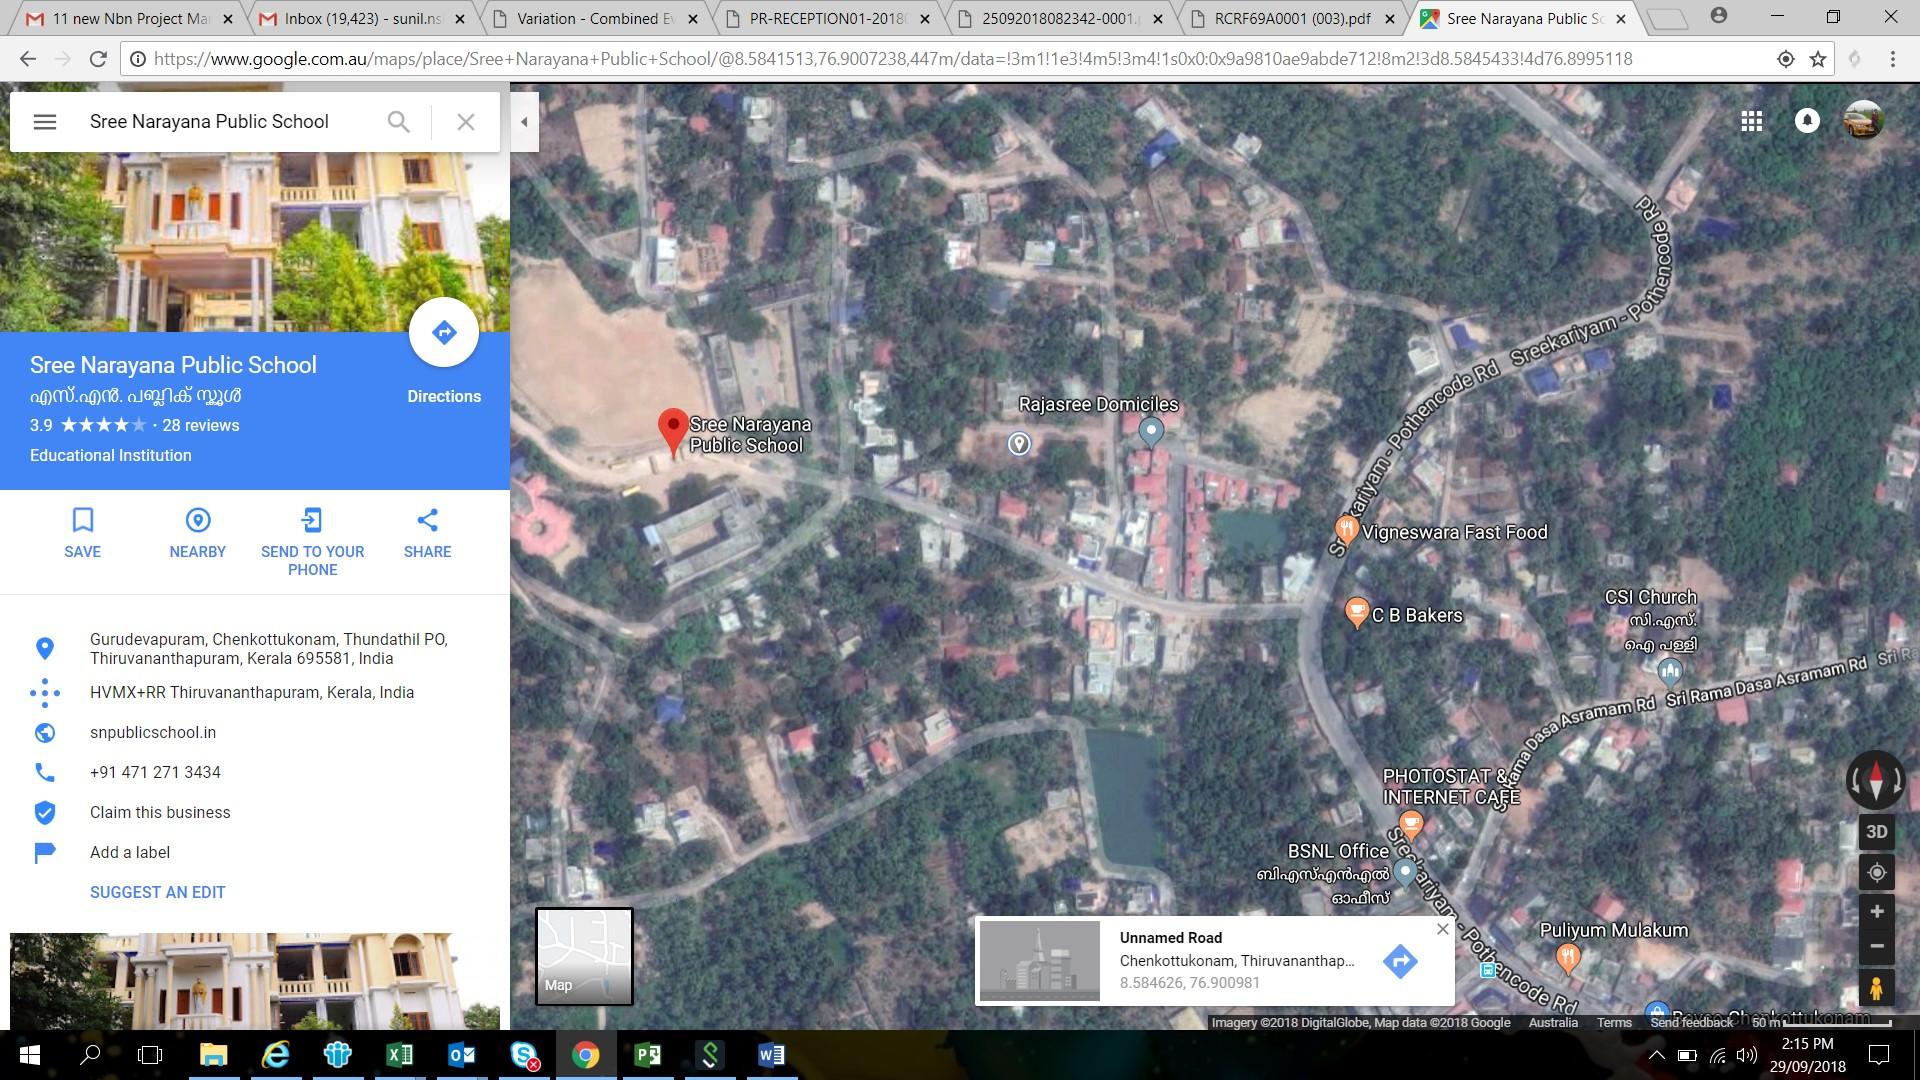 Residential Property For Sale Near Sree Narayana Public School, Chenkottukonam, Thiruvananthapuram